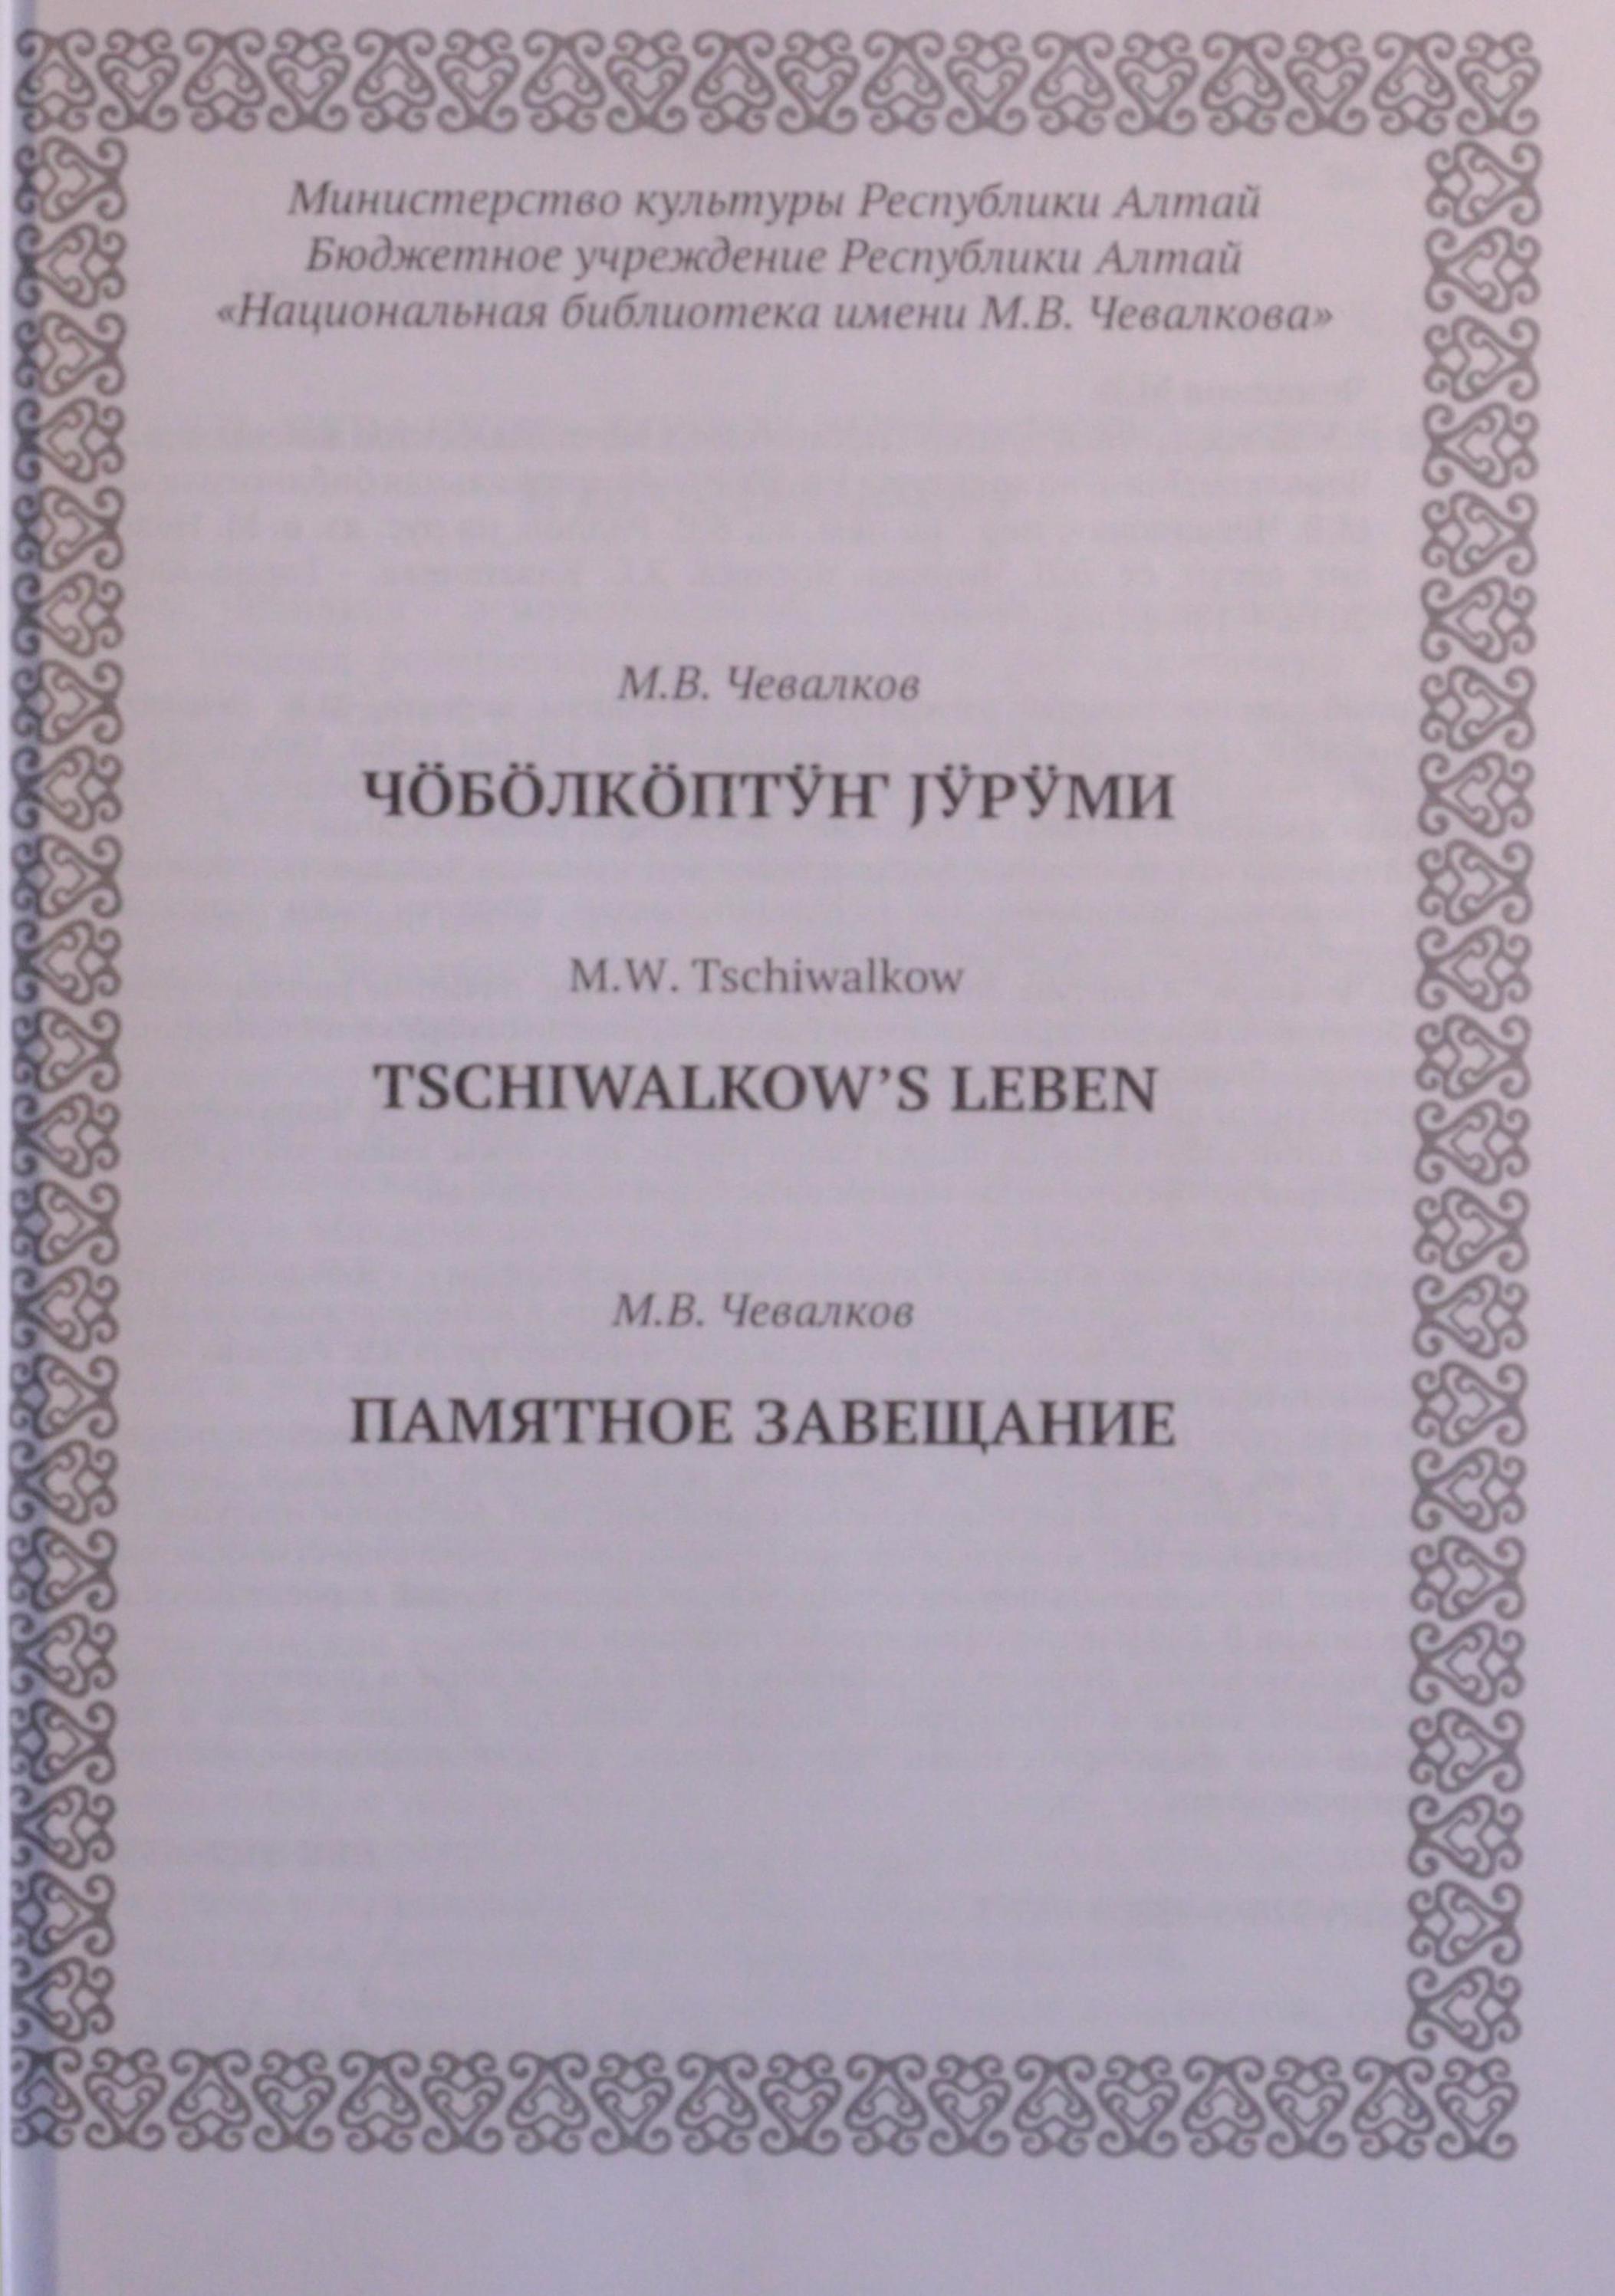 520 с.5